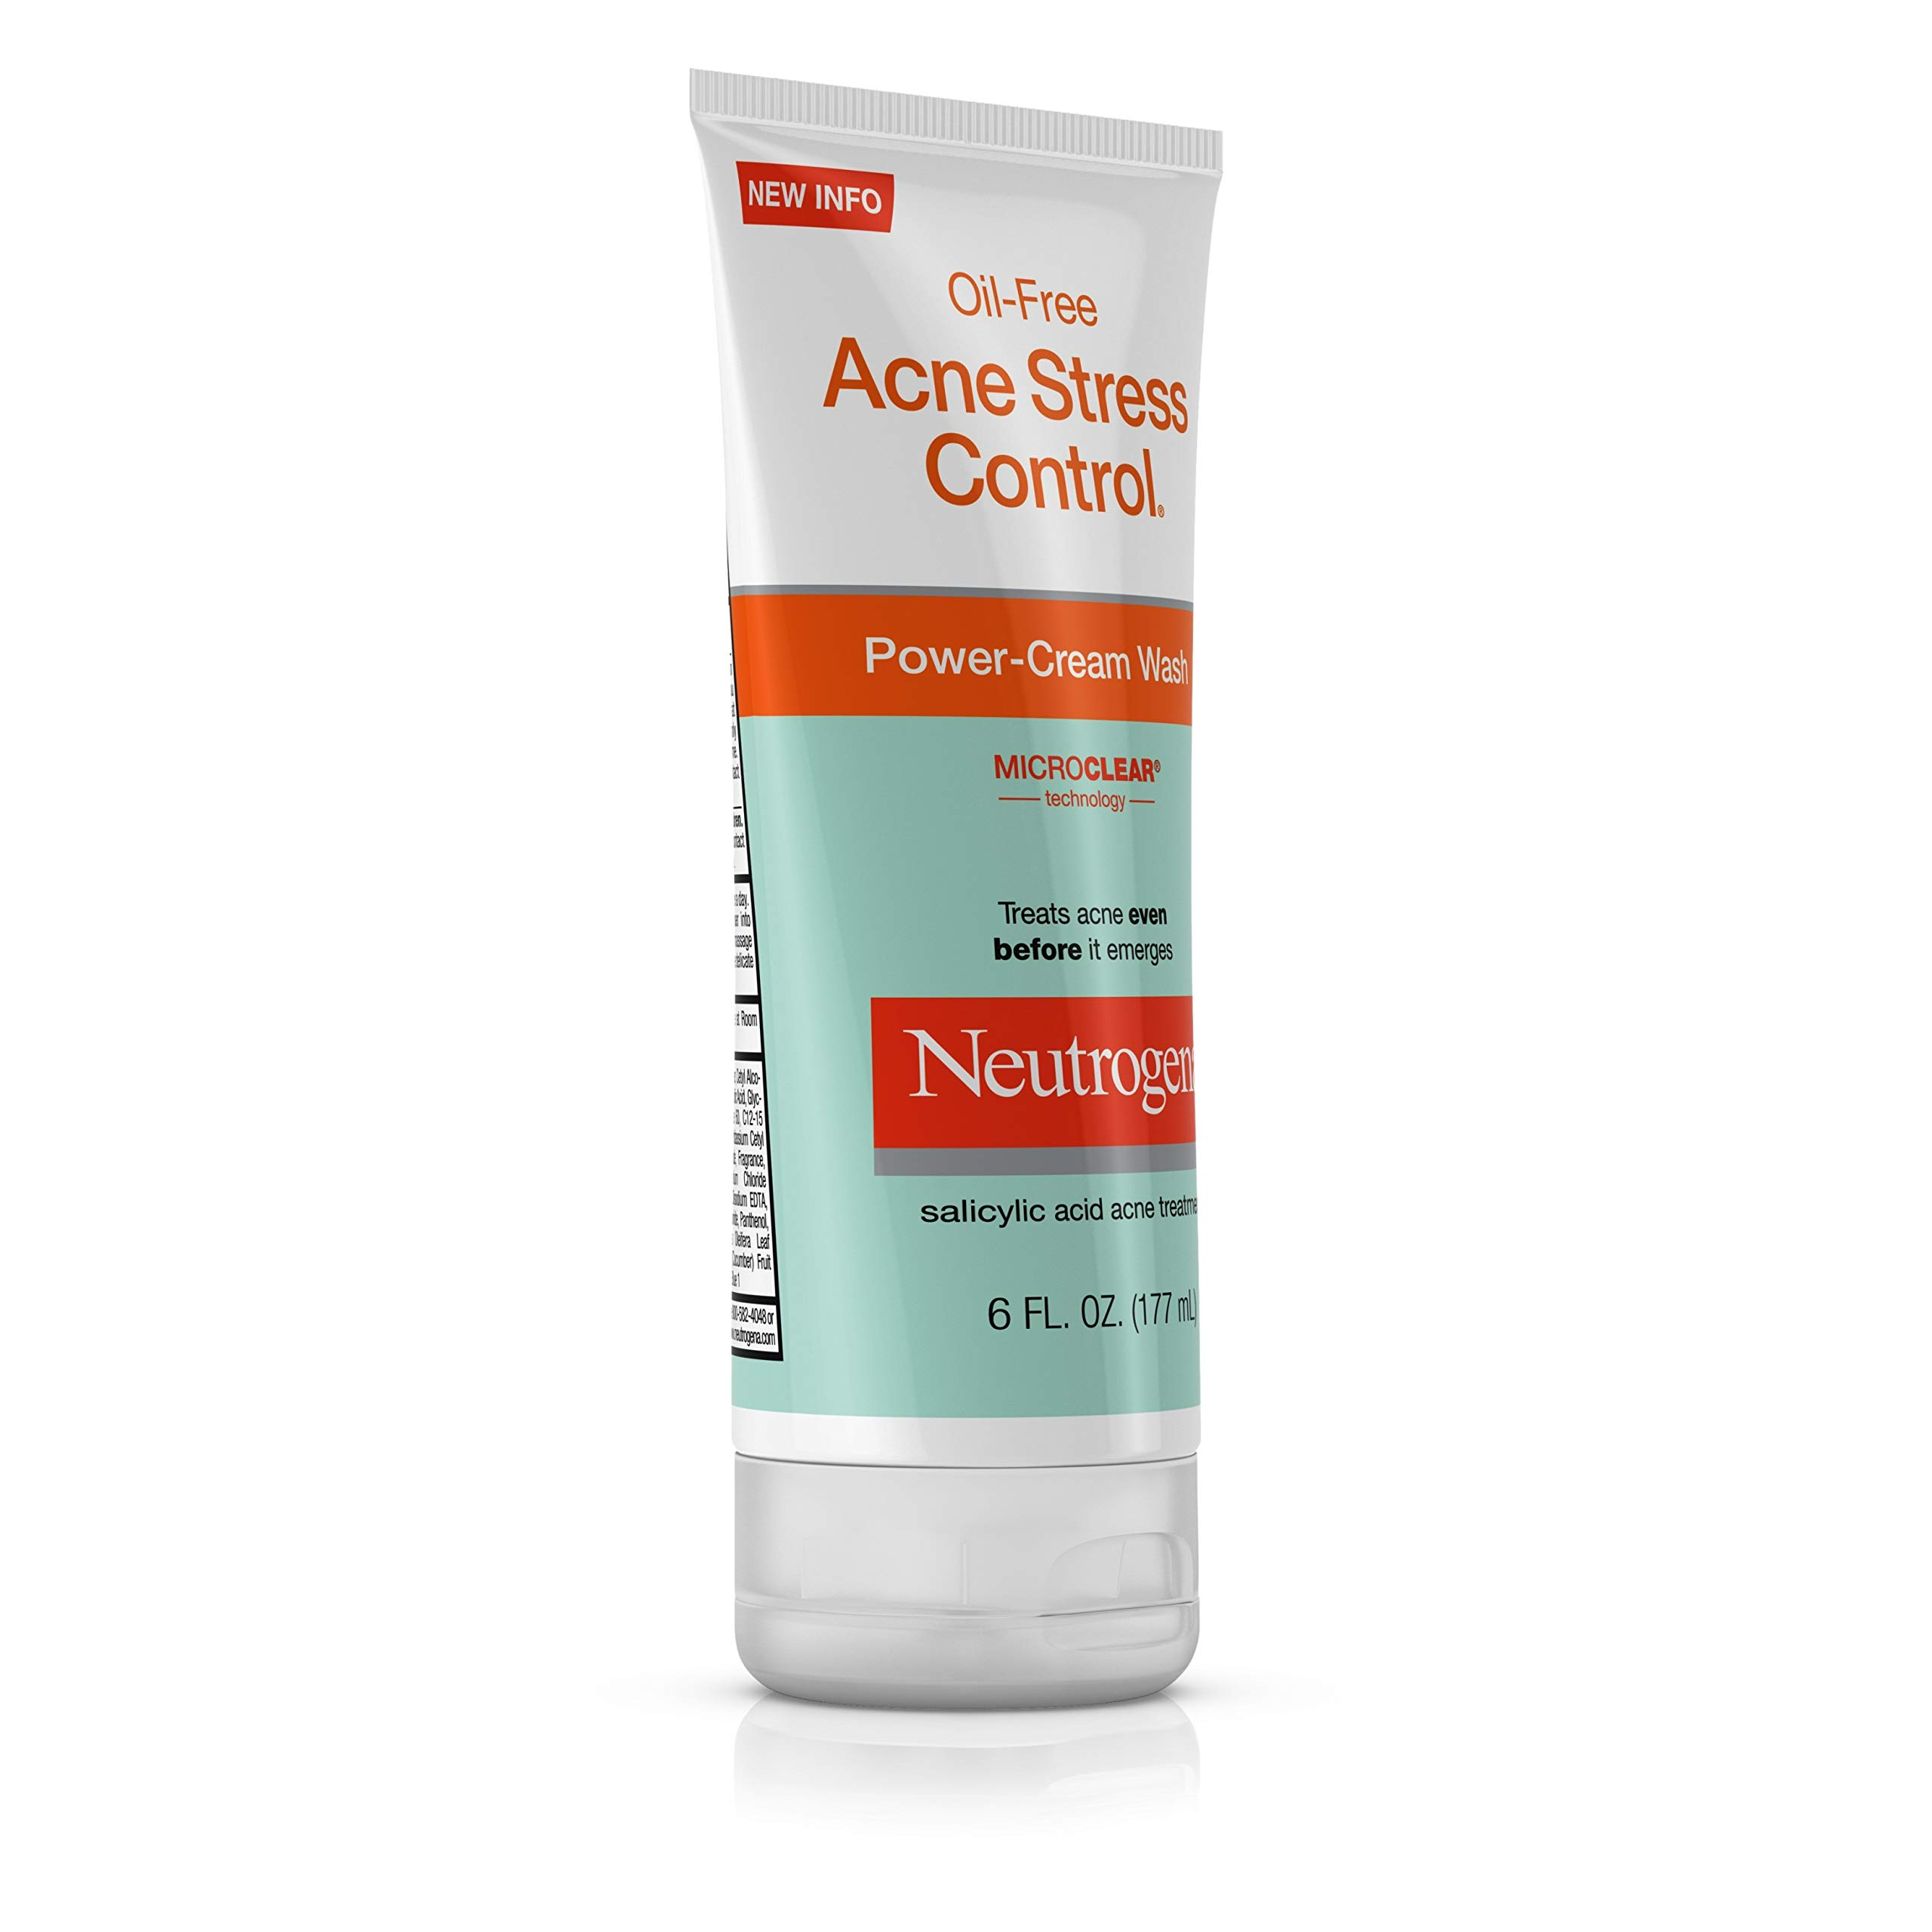 Acnemoist Best Moisturising Cream For Sensitive Acne Prone Skin